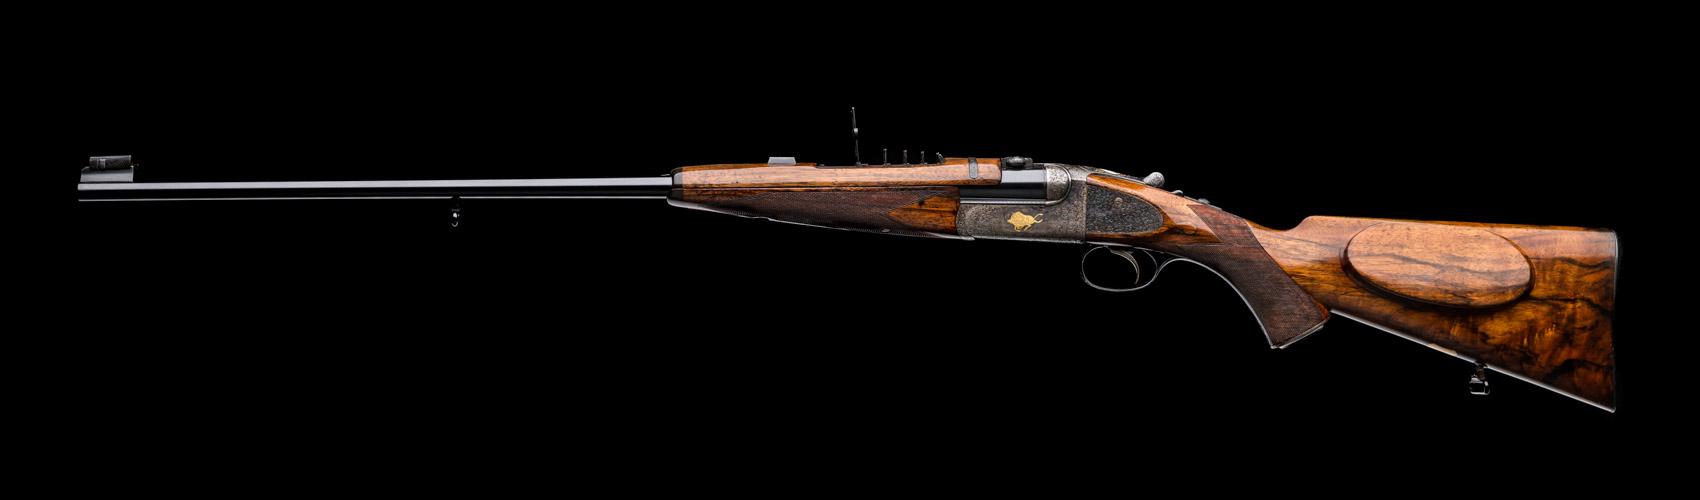 Westley Richards, droplock, 303, vintage rifle